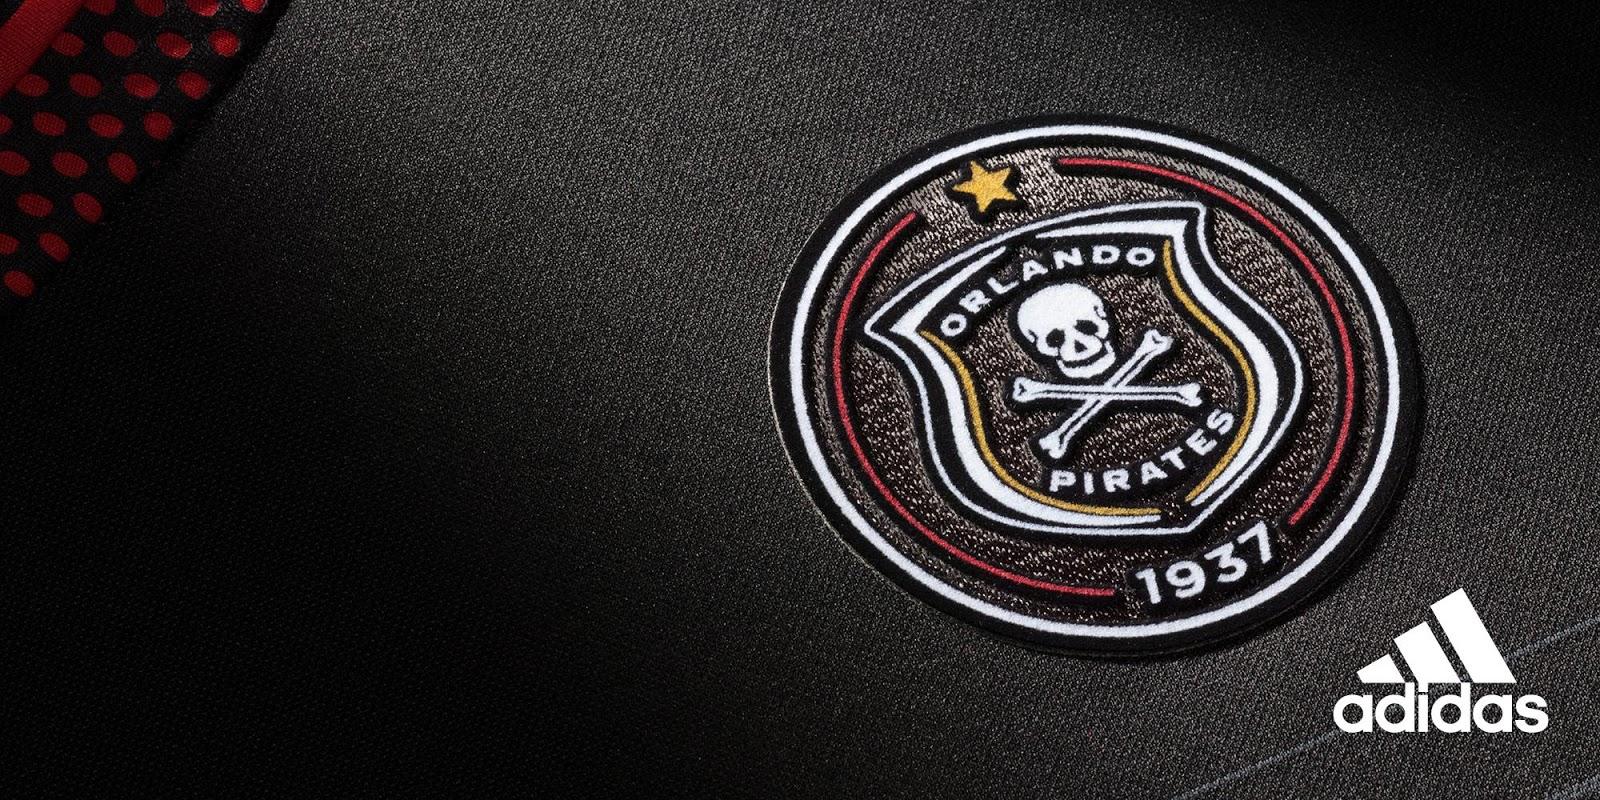 Orlando Pirates 15-16 Kits Released - Footy Headlines